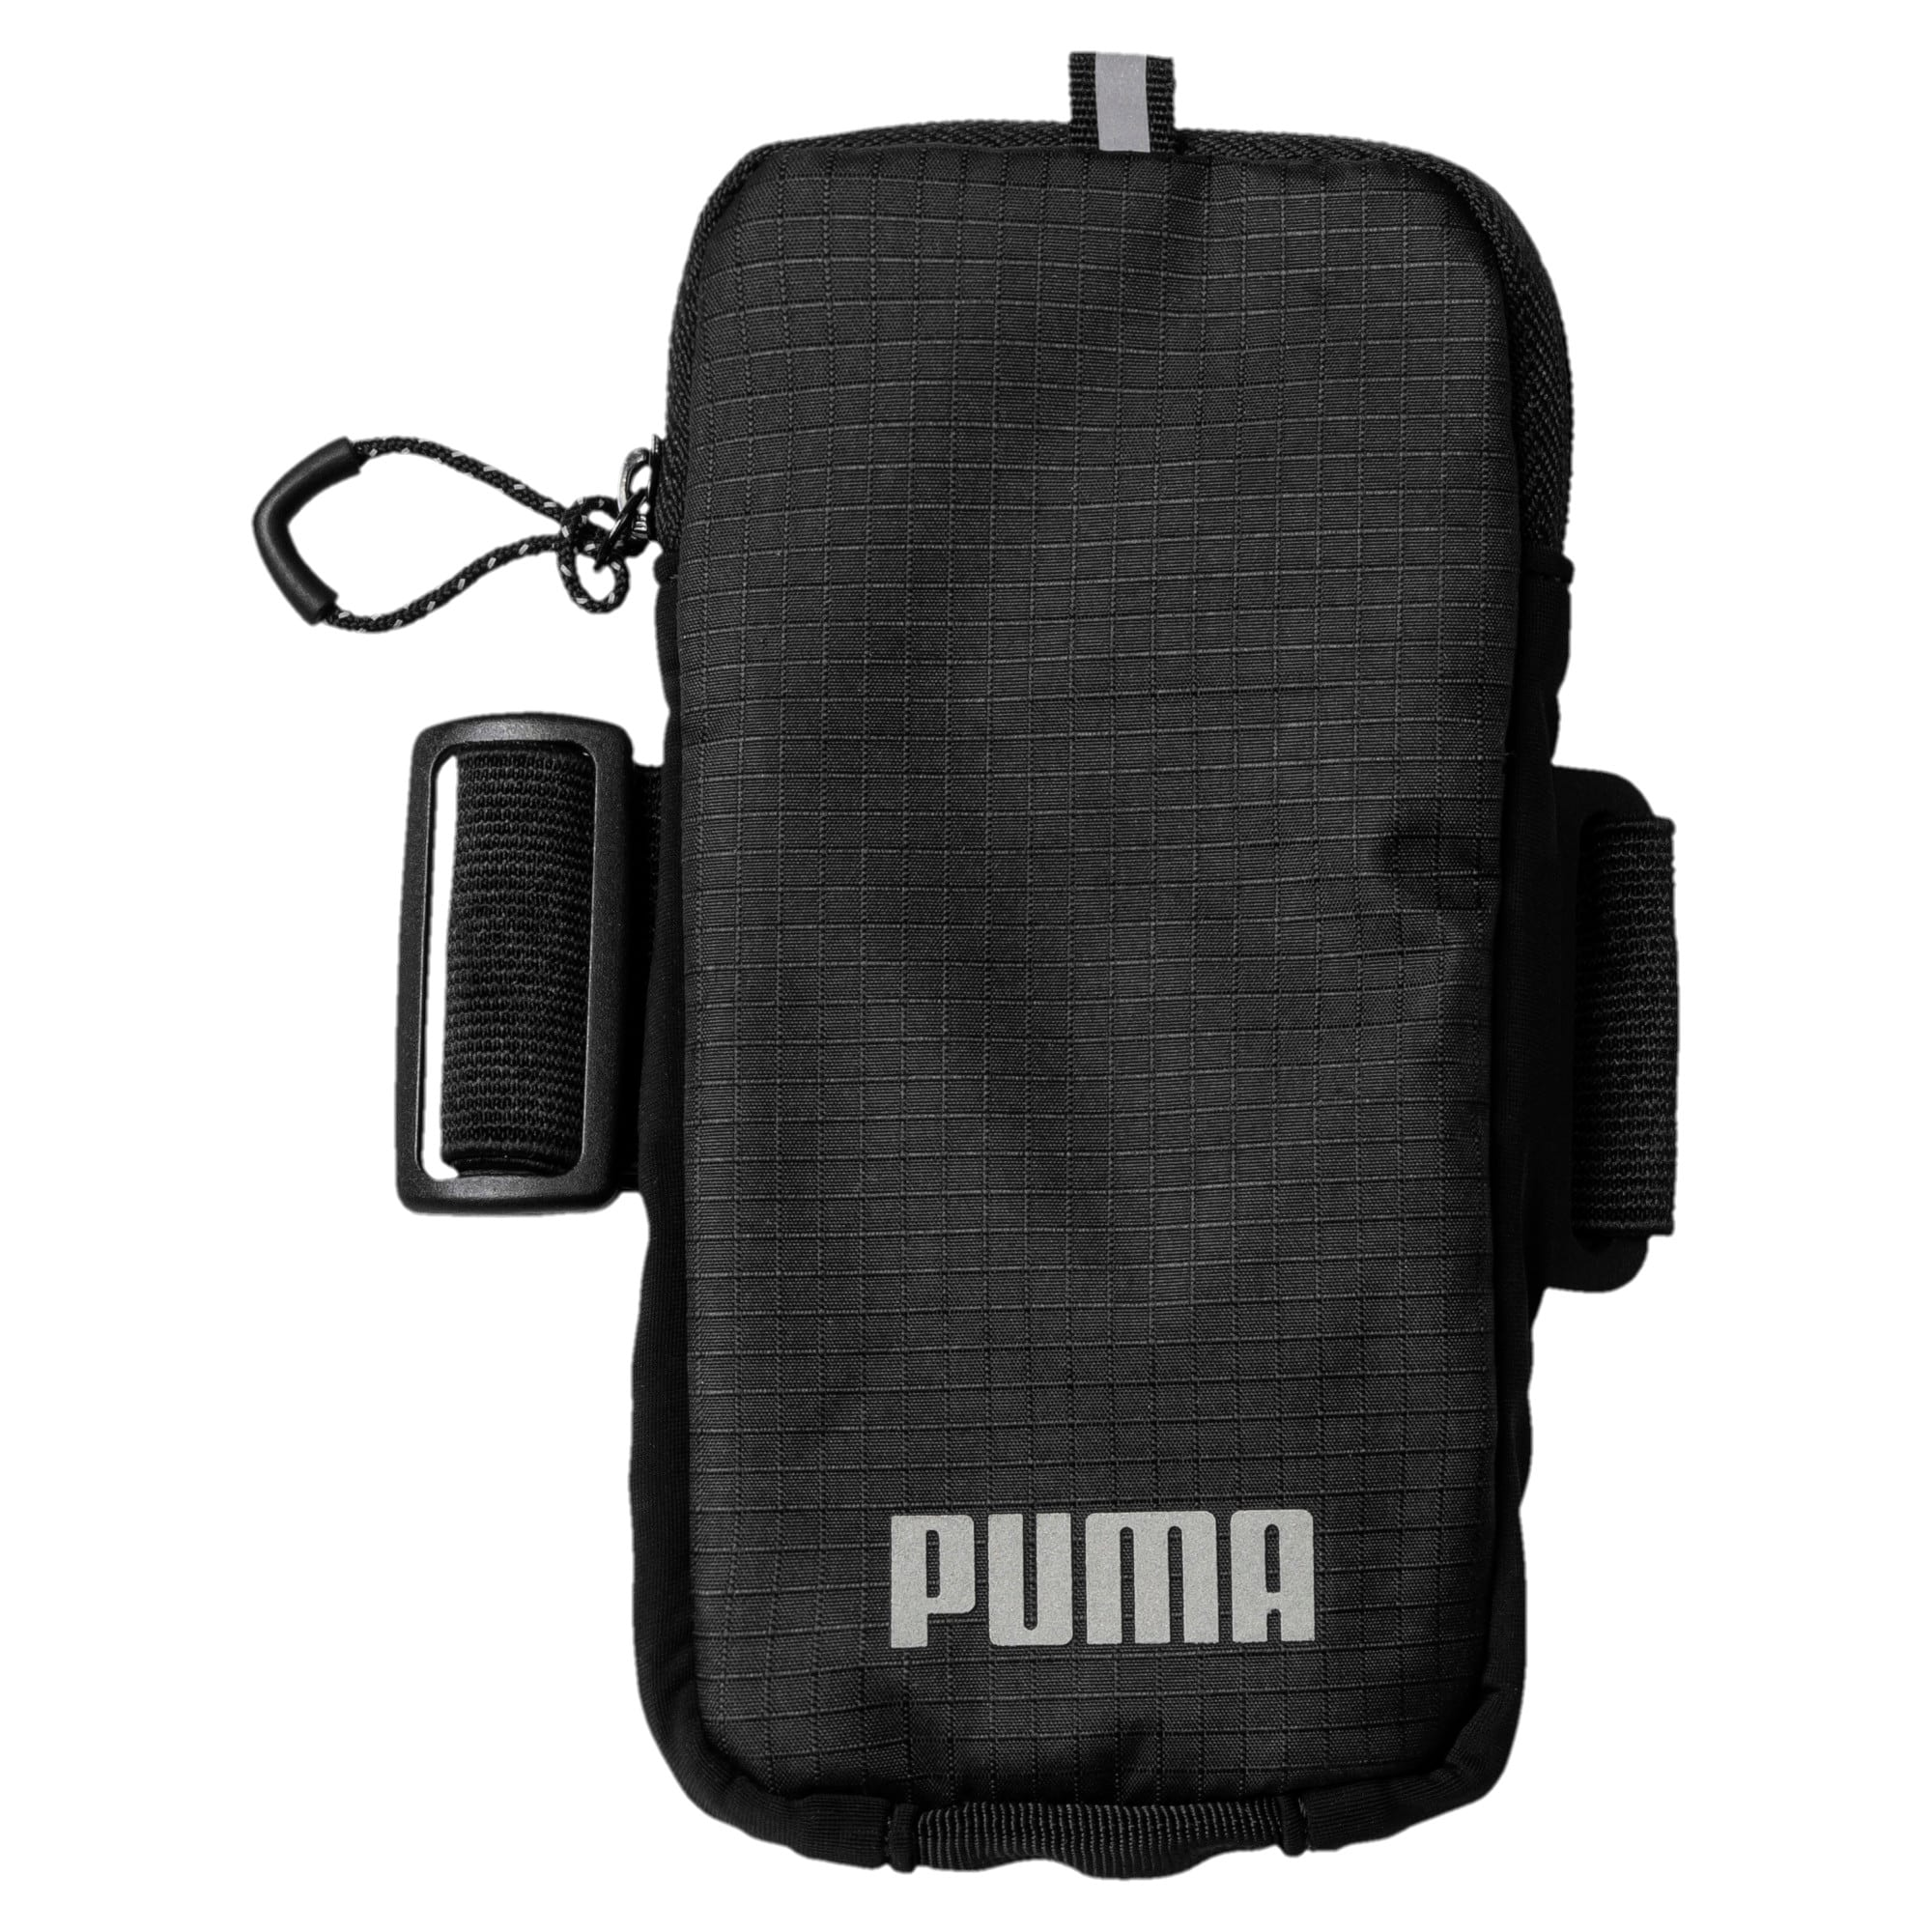 Thumbnail 1 of Running Arm Pocket, Puma Black-Puma Silver, medium-IND